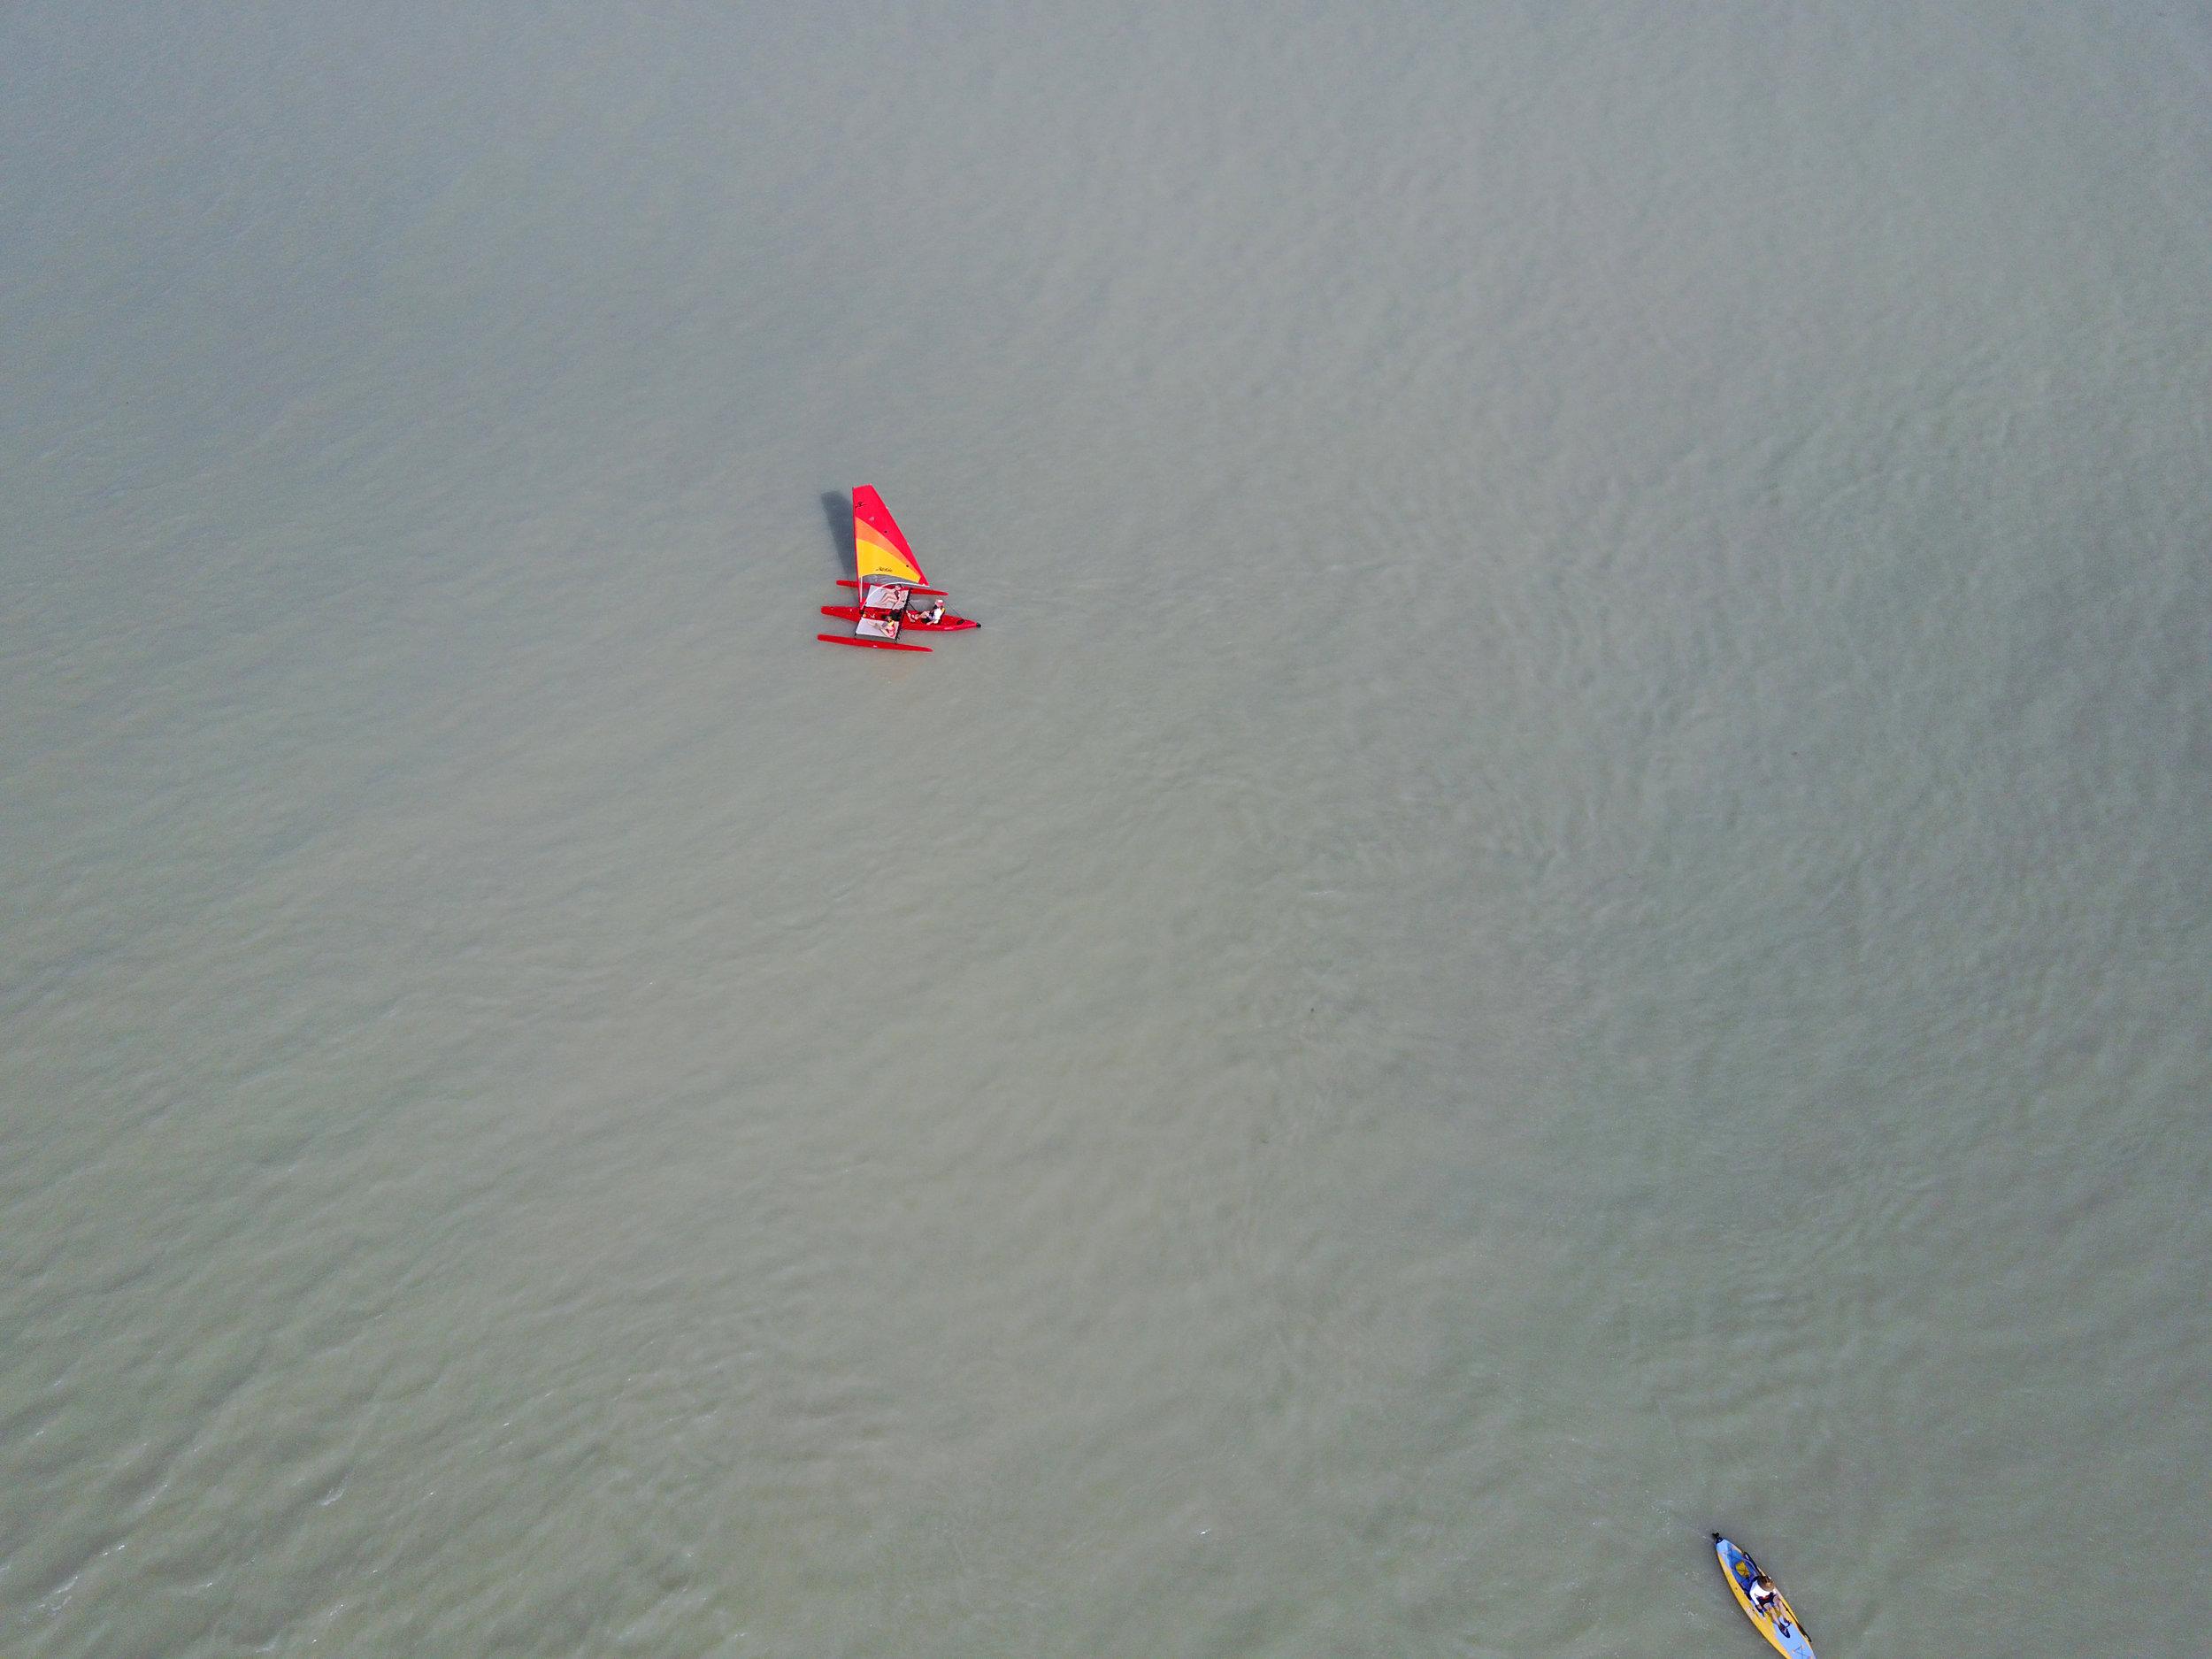 TandemIsland_action_red_FL_aerial_Jeff_micro_0029_full.jpg